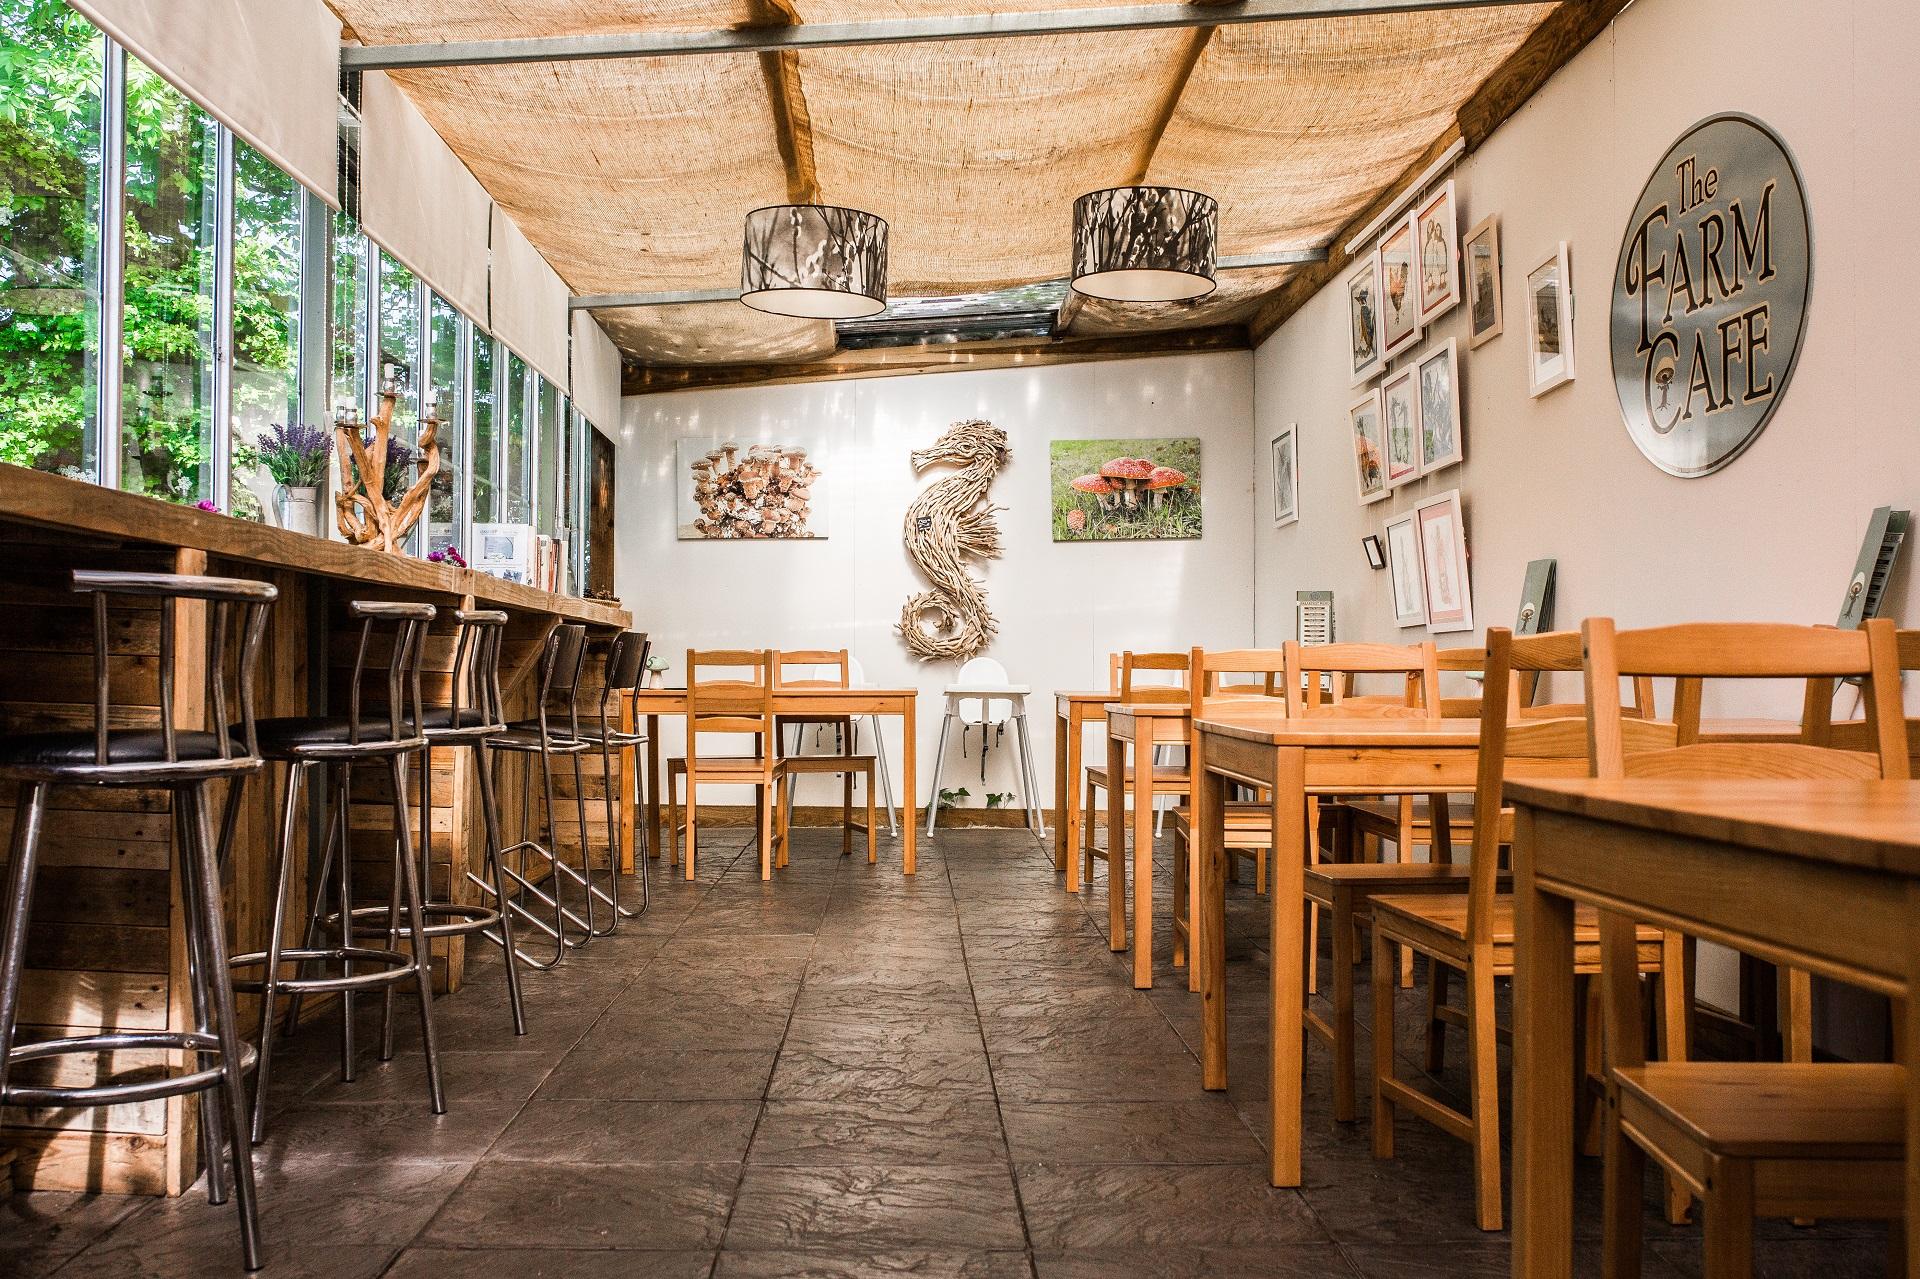 Forest Fungi - The Farm Cafe